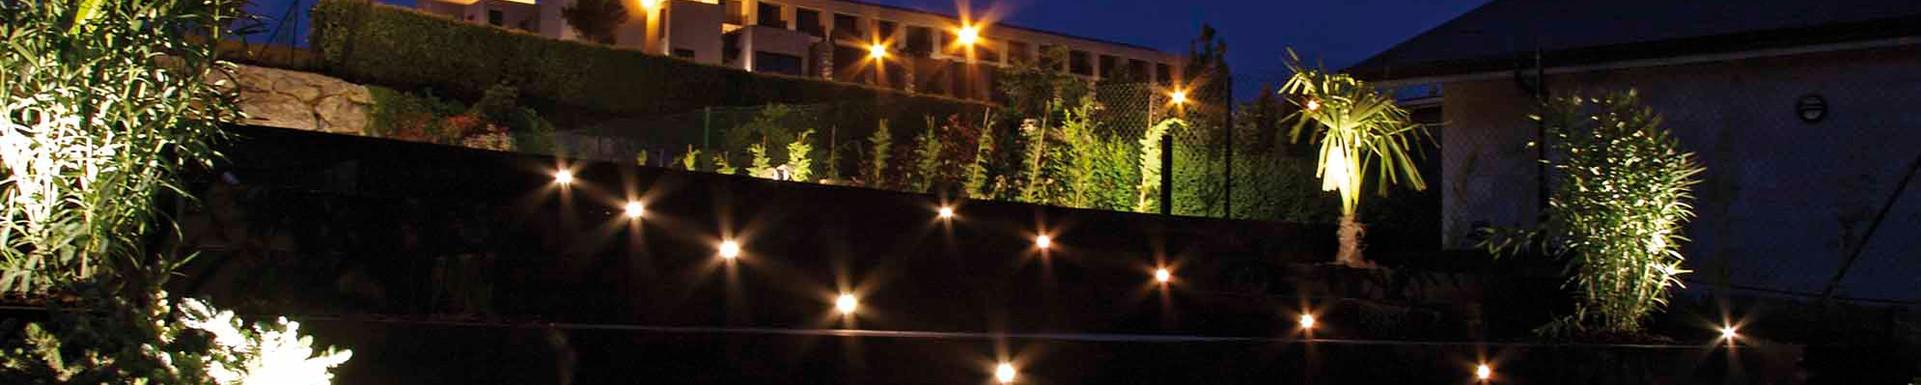 proyectos-iluminacion-jardin-8.jpg